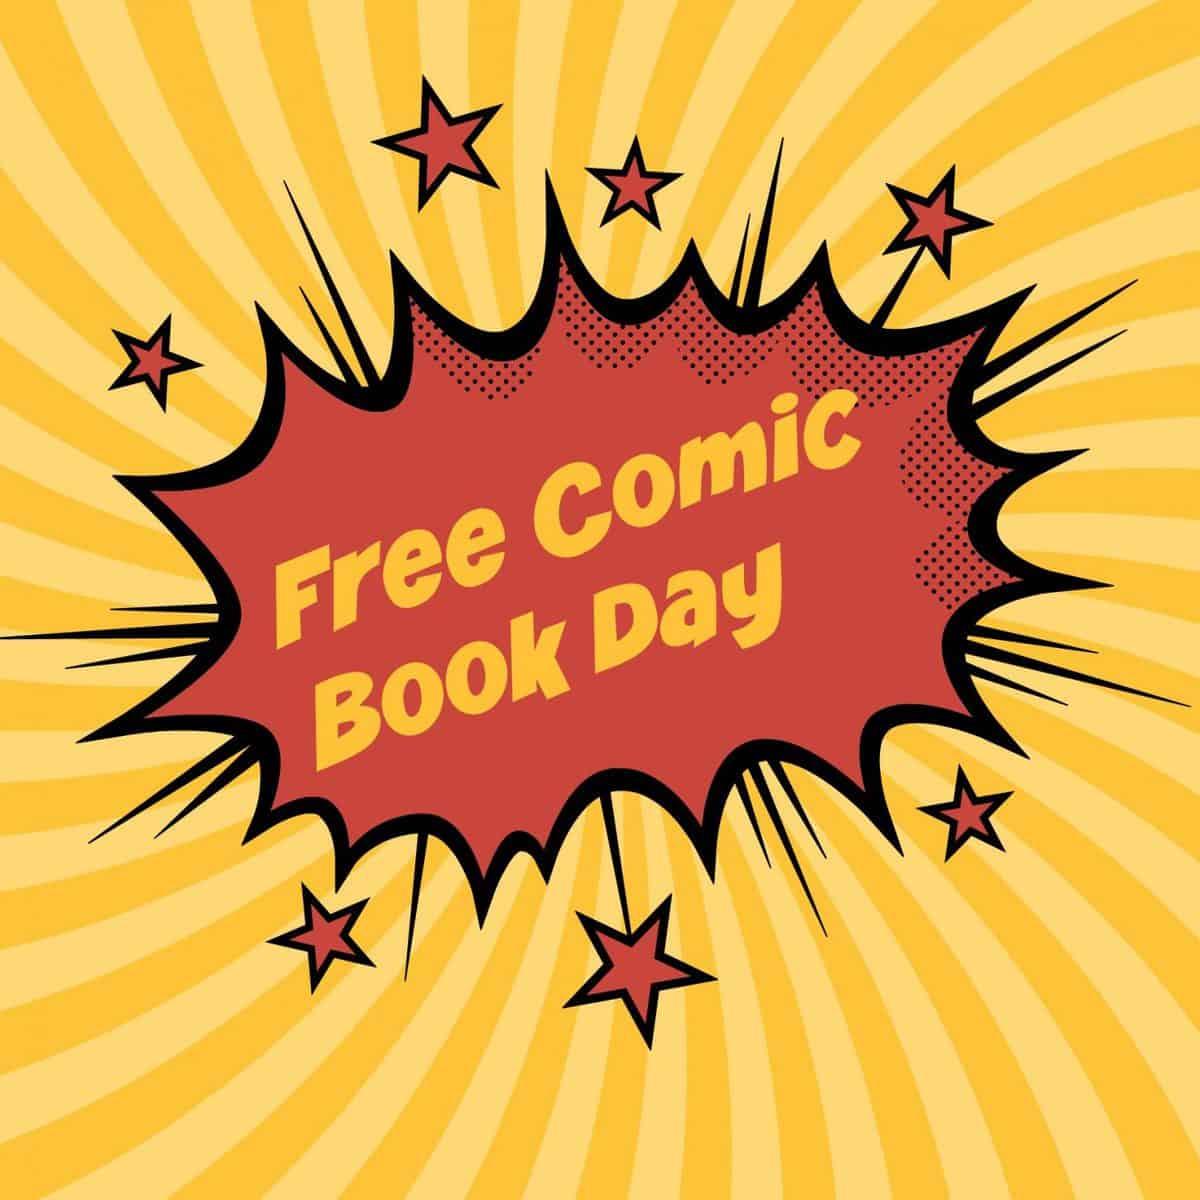 Ann Arbor Free Comic Book Day 2017